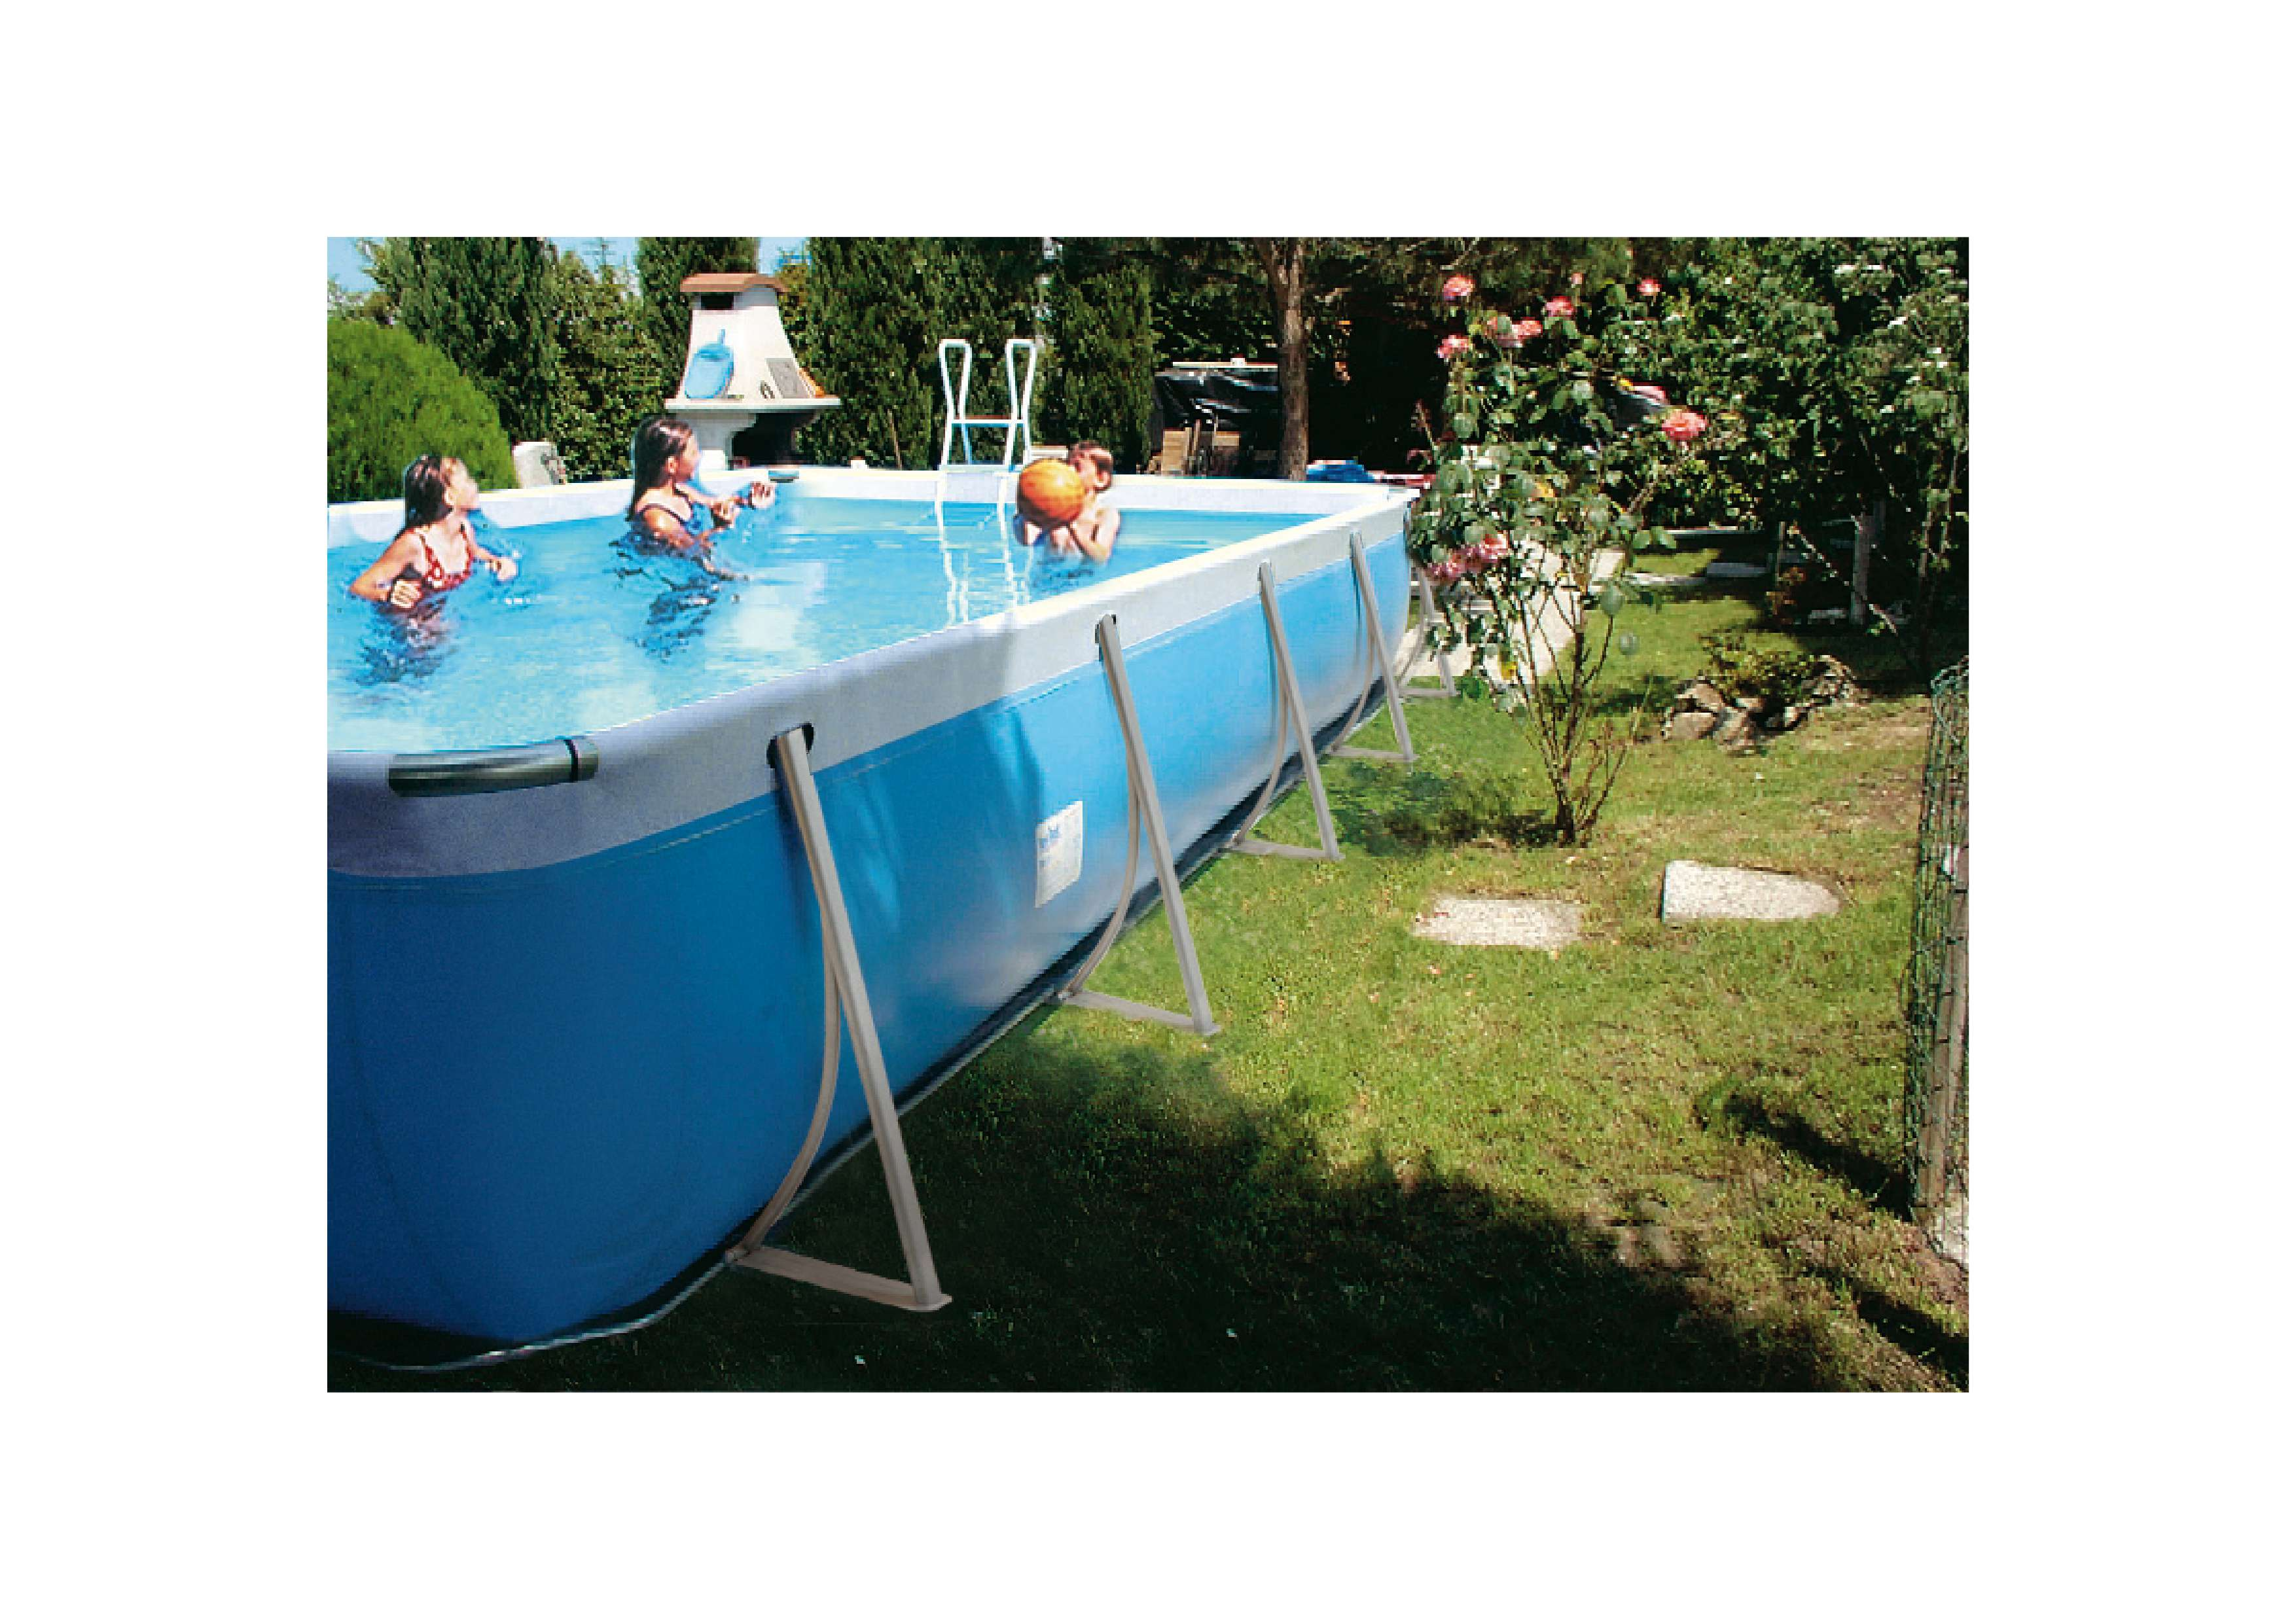 Idra piscina fuori terra autoportanti 1000 piscine for 1000 piscine